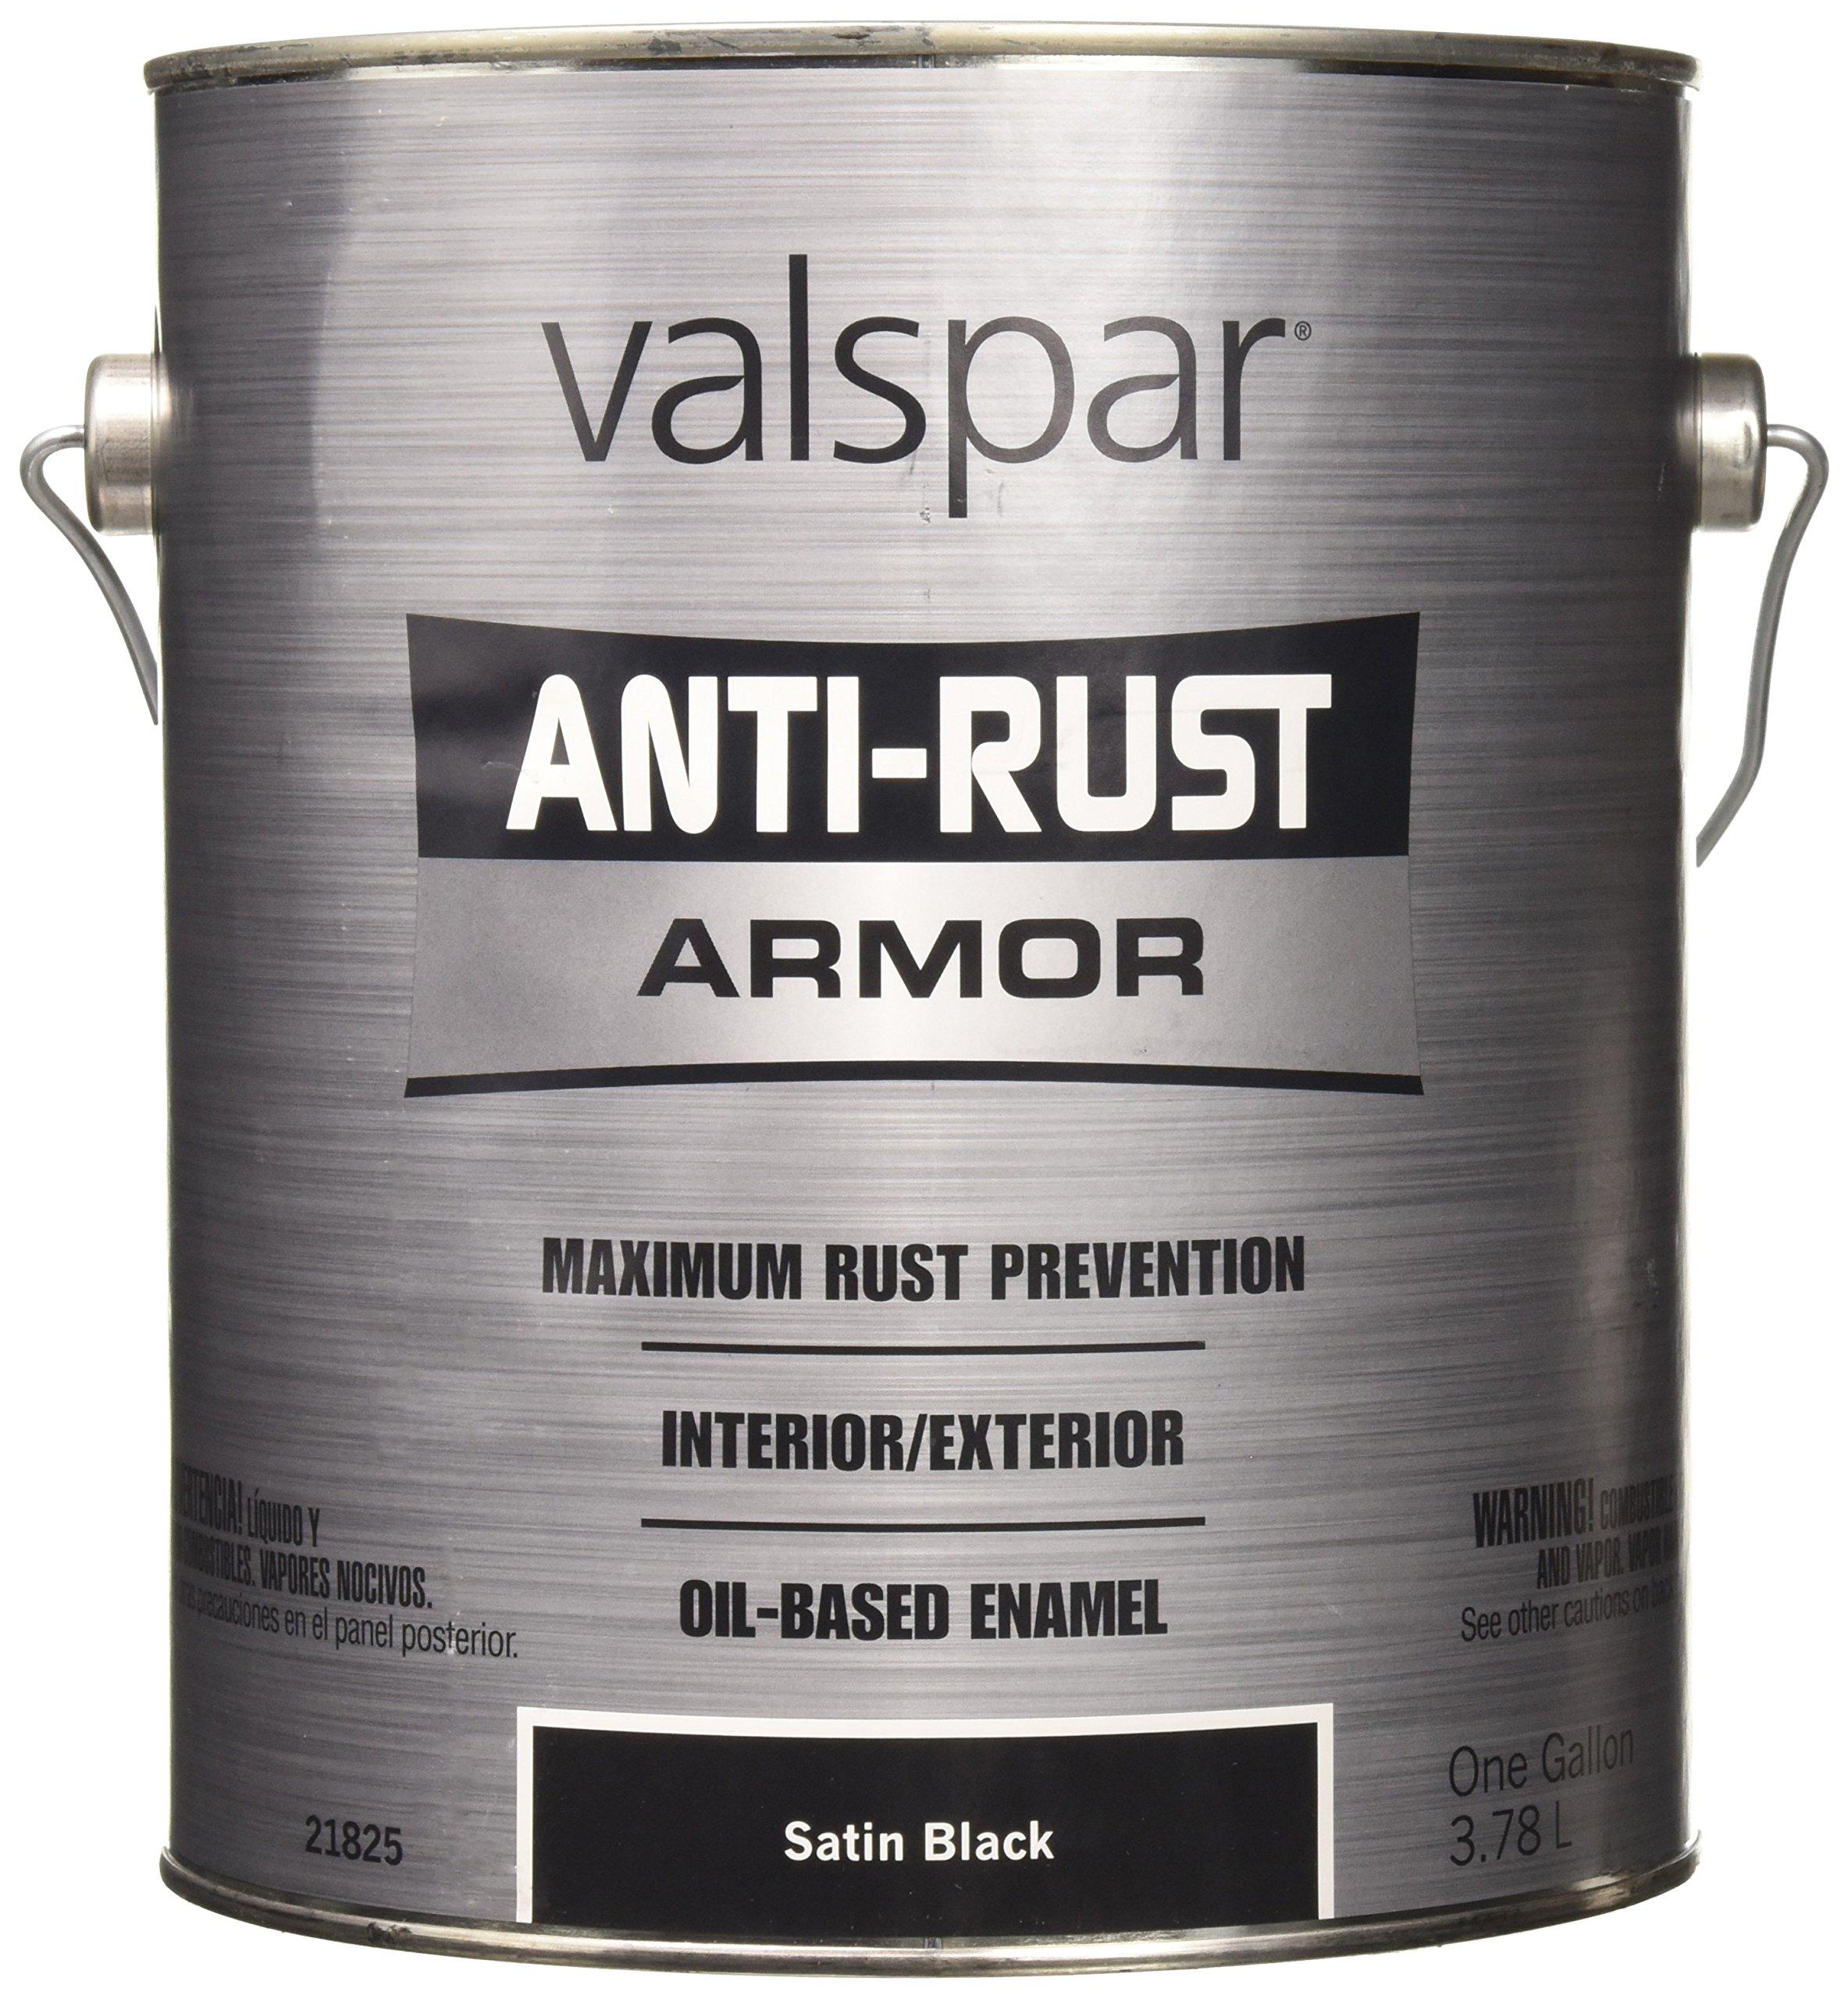 Valspar 21825G Satin Black Enamel - 1 Gallon